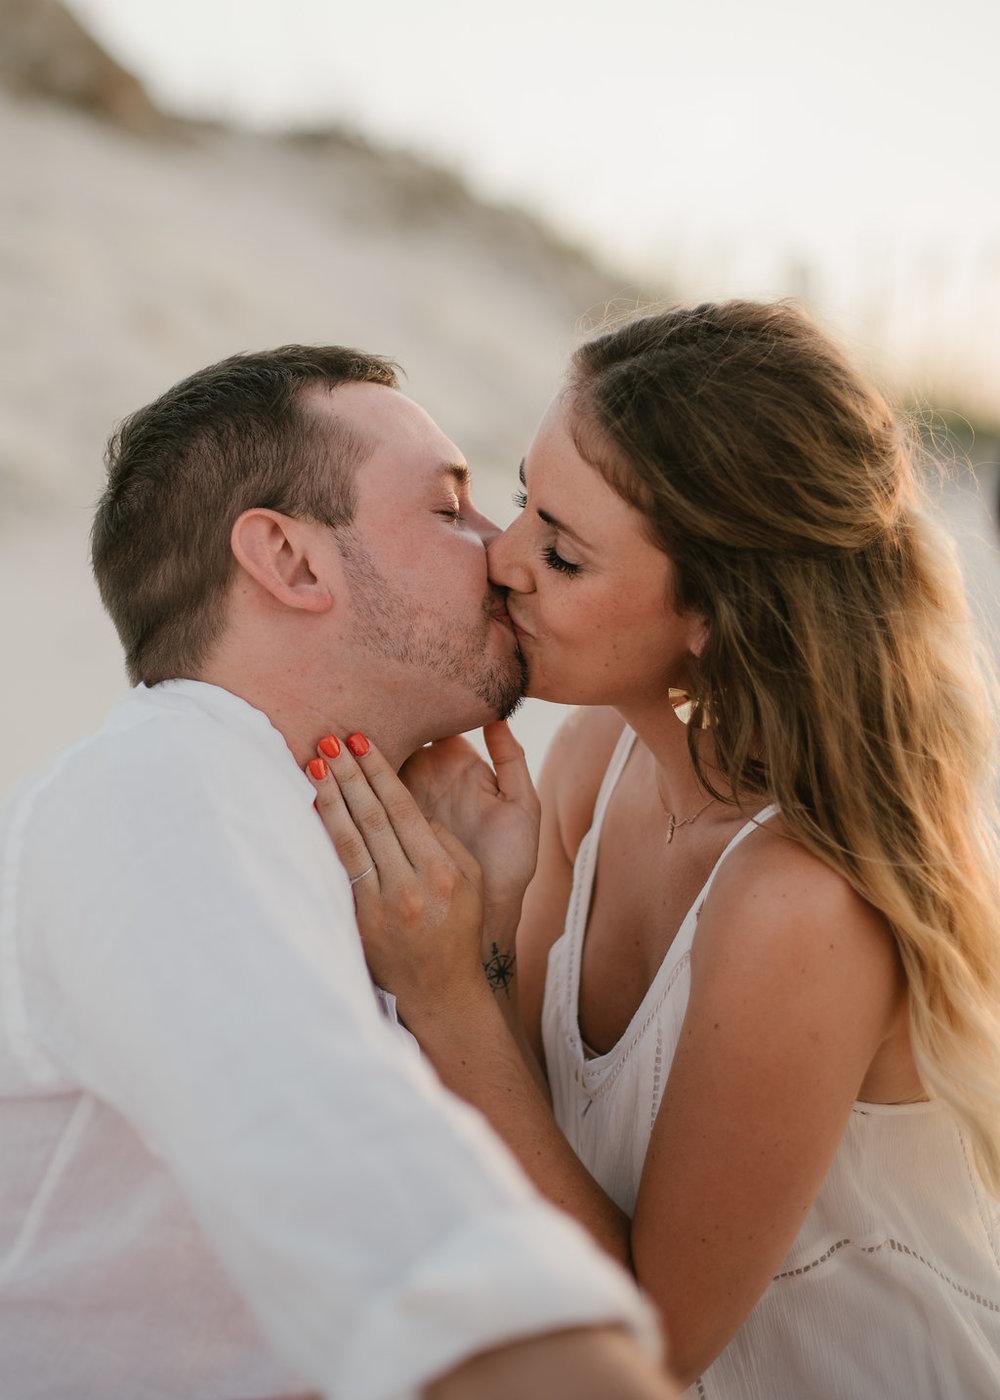 Morgan-Jordan-New-Smyrna-Beach-Engagement-65.jpg